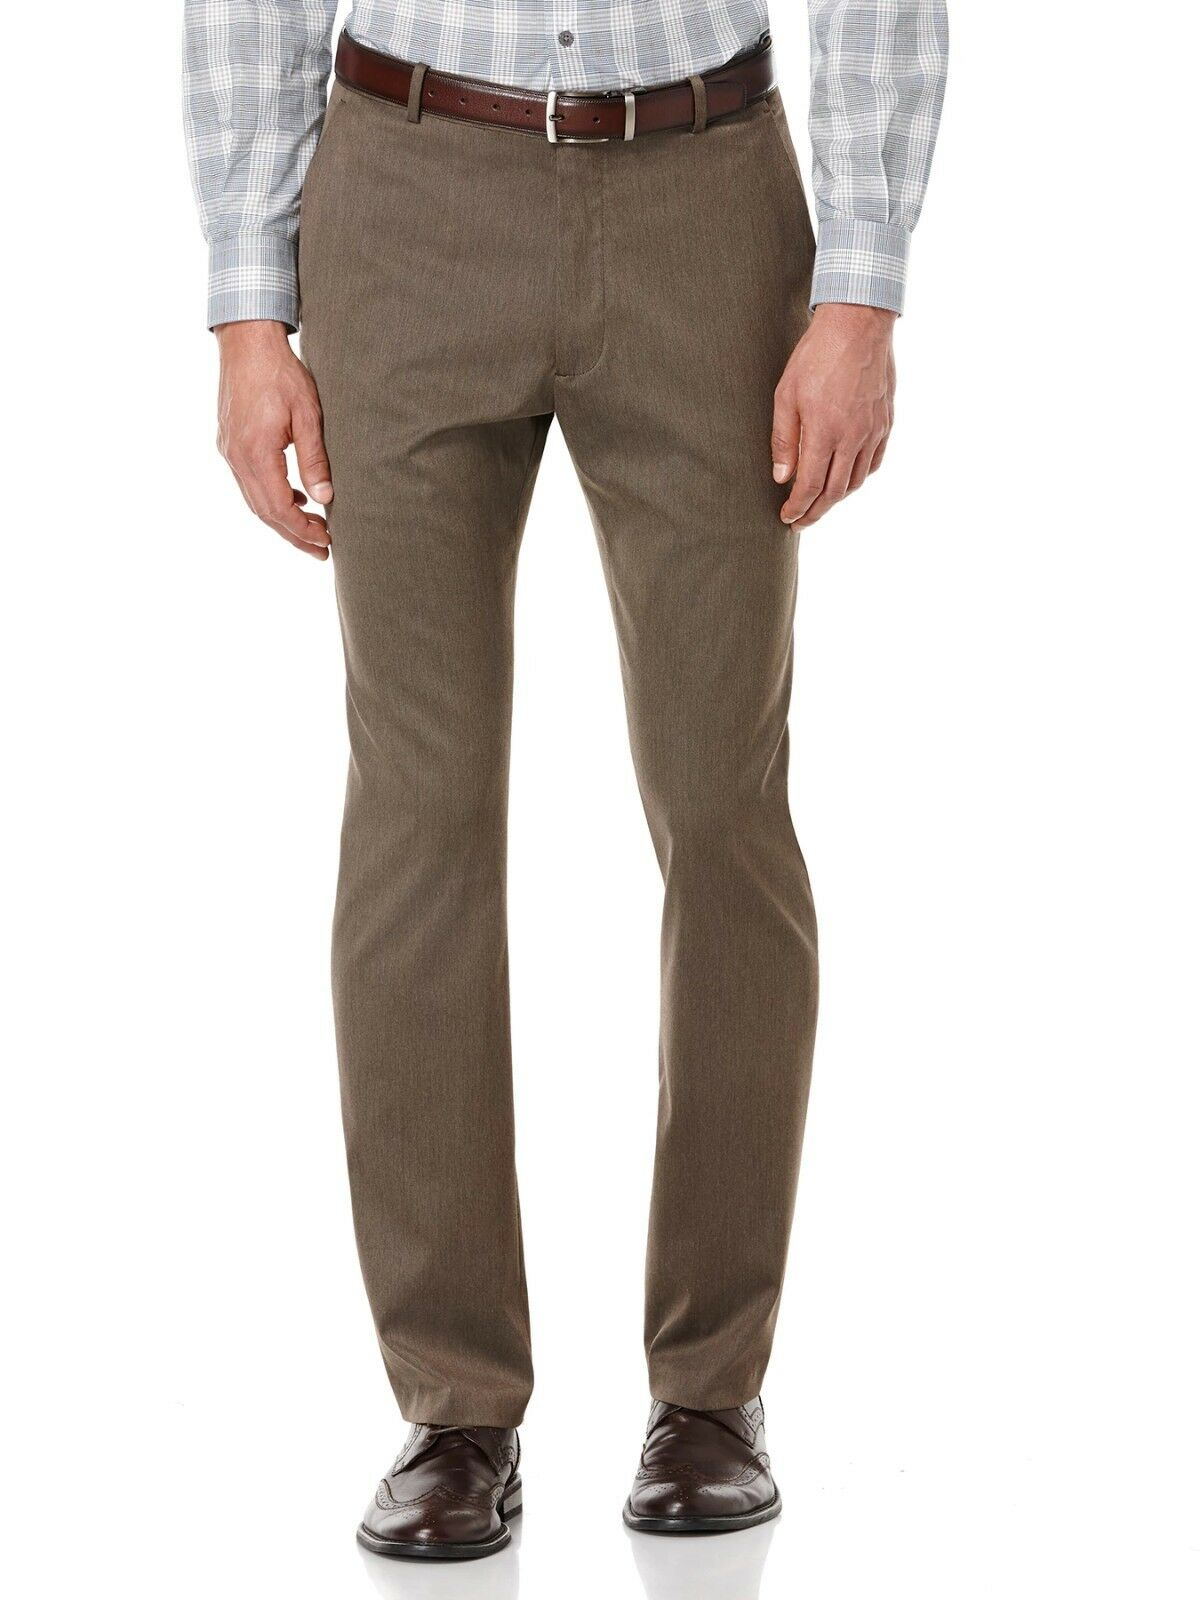 PERRY ELLIS PORTFOLIO MEN BROWN FLAT FRONT SLIM FIT DRESS PANTS 30 W 30 L